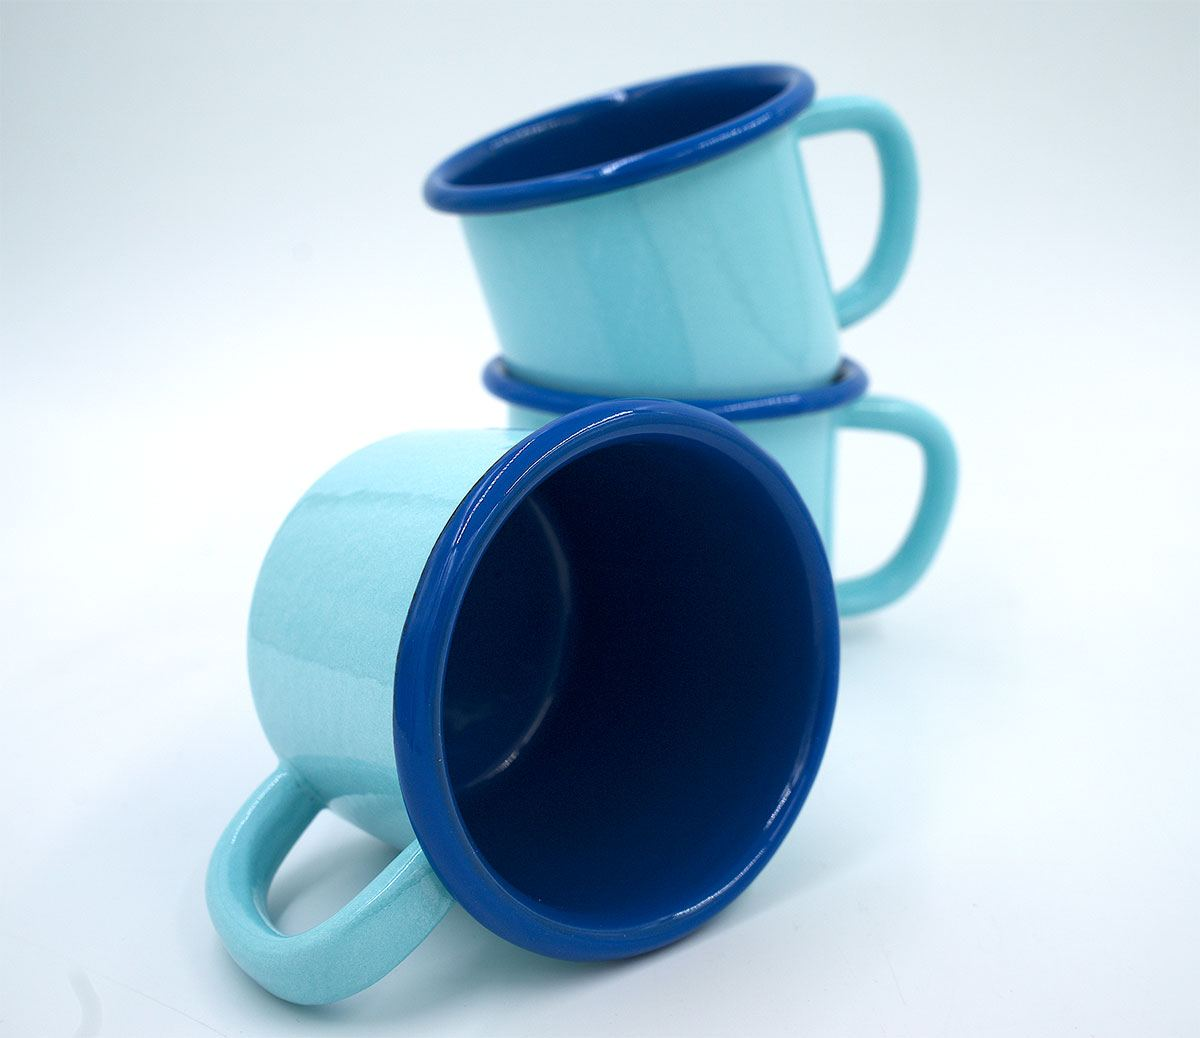 Becher Emaille Hellblau Blau